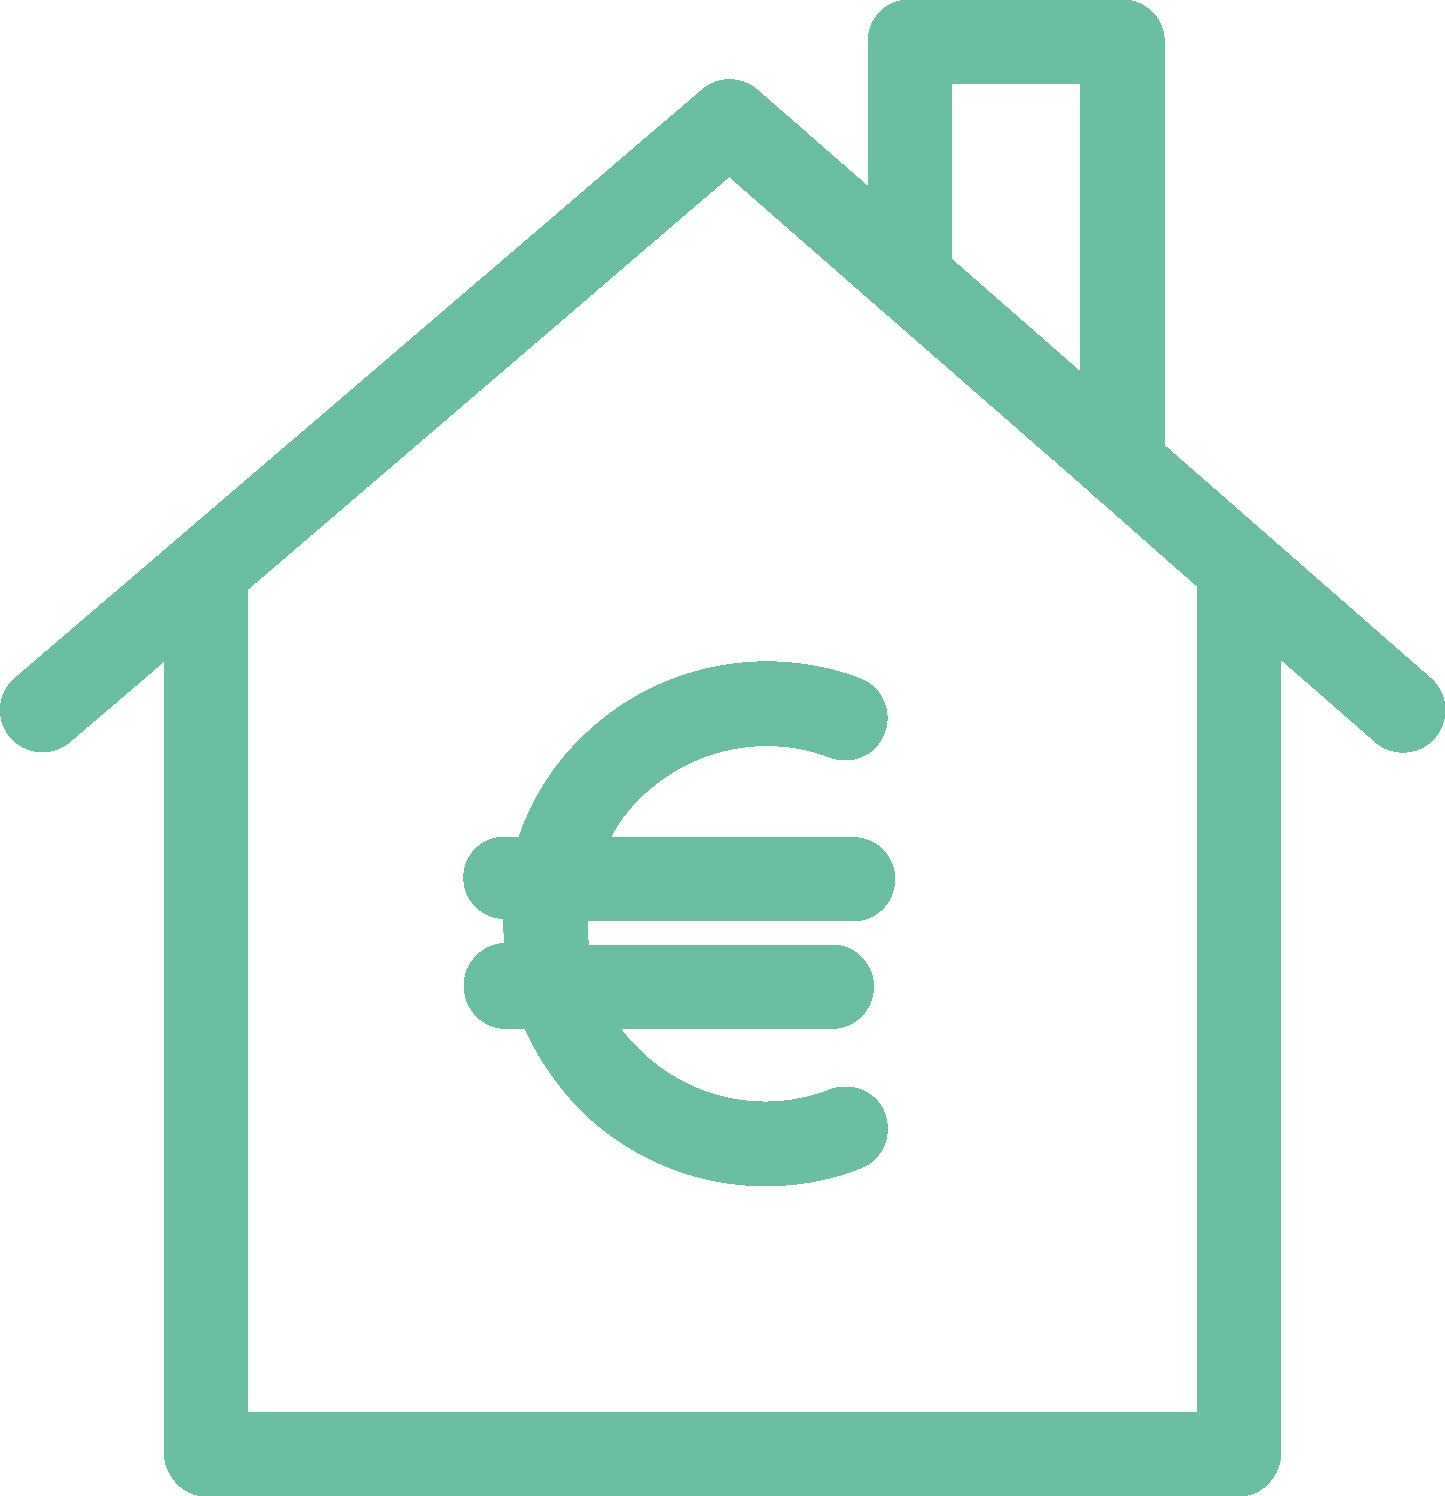 picto-financement-maisons-hexagone